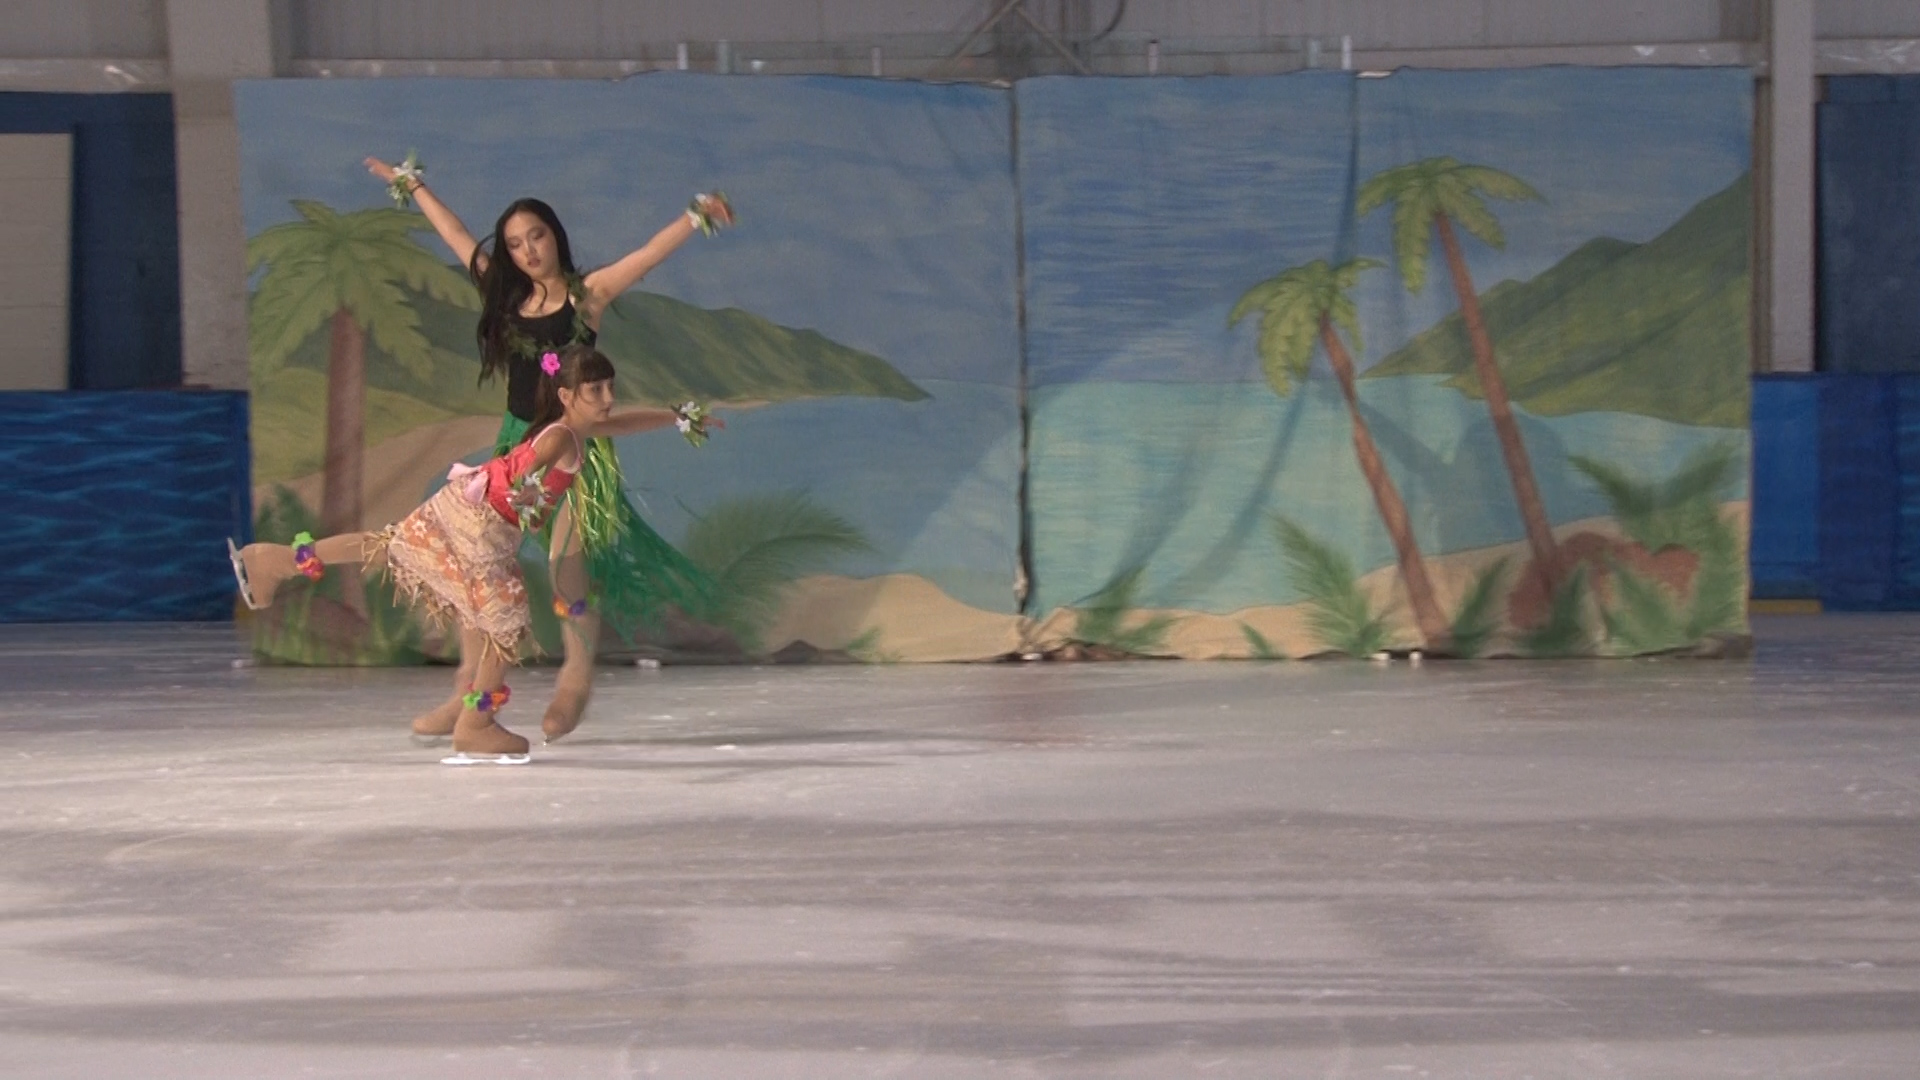 Power Play Maui Skate on Ice 071417.00_08_25_25.Still011.jpg